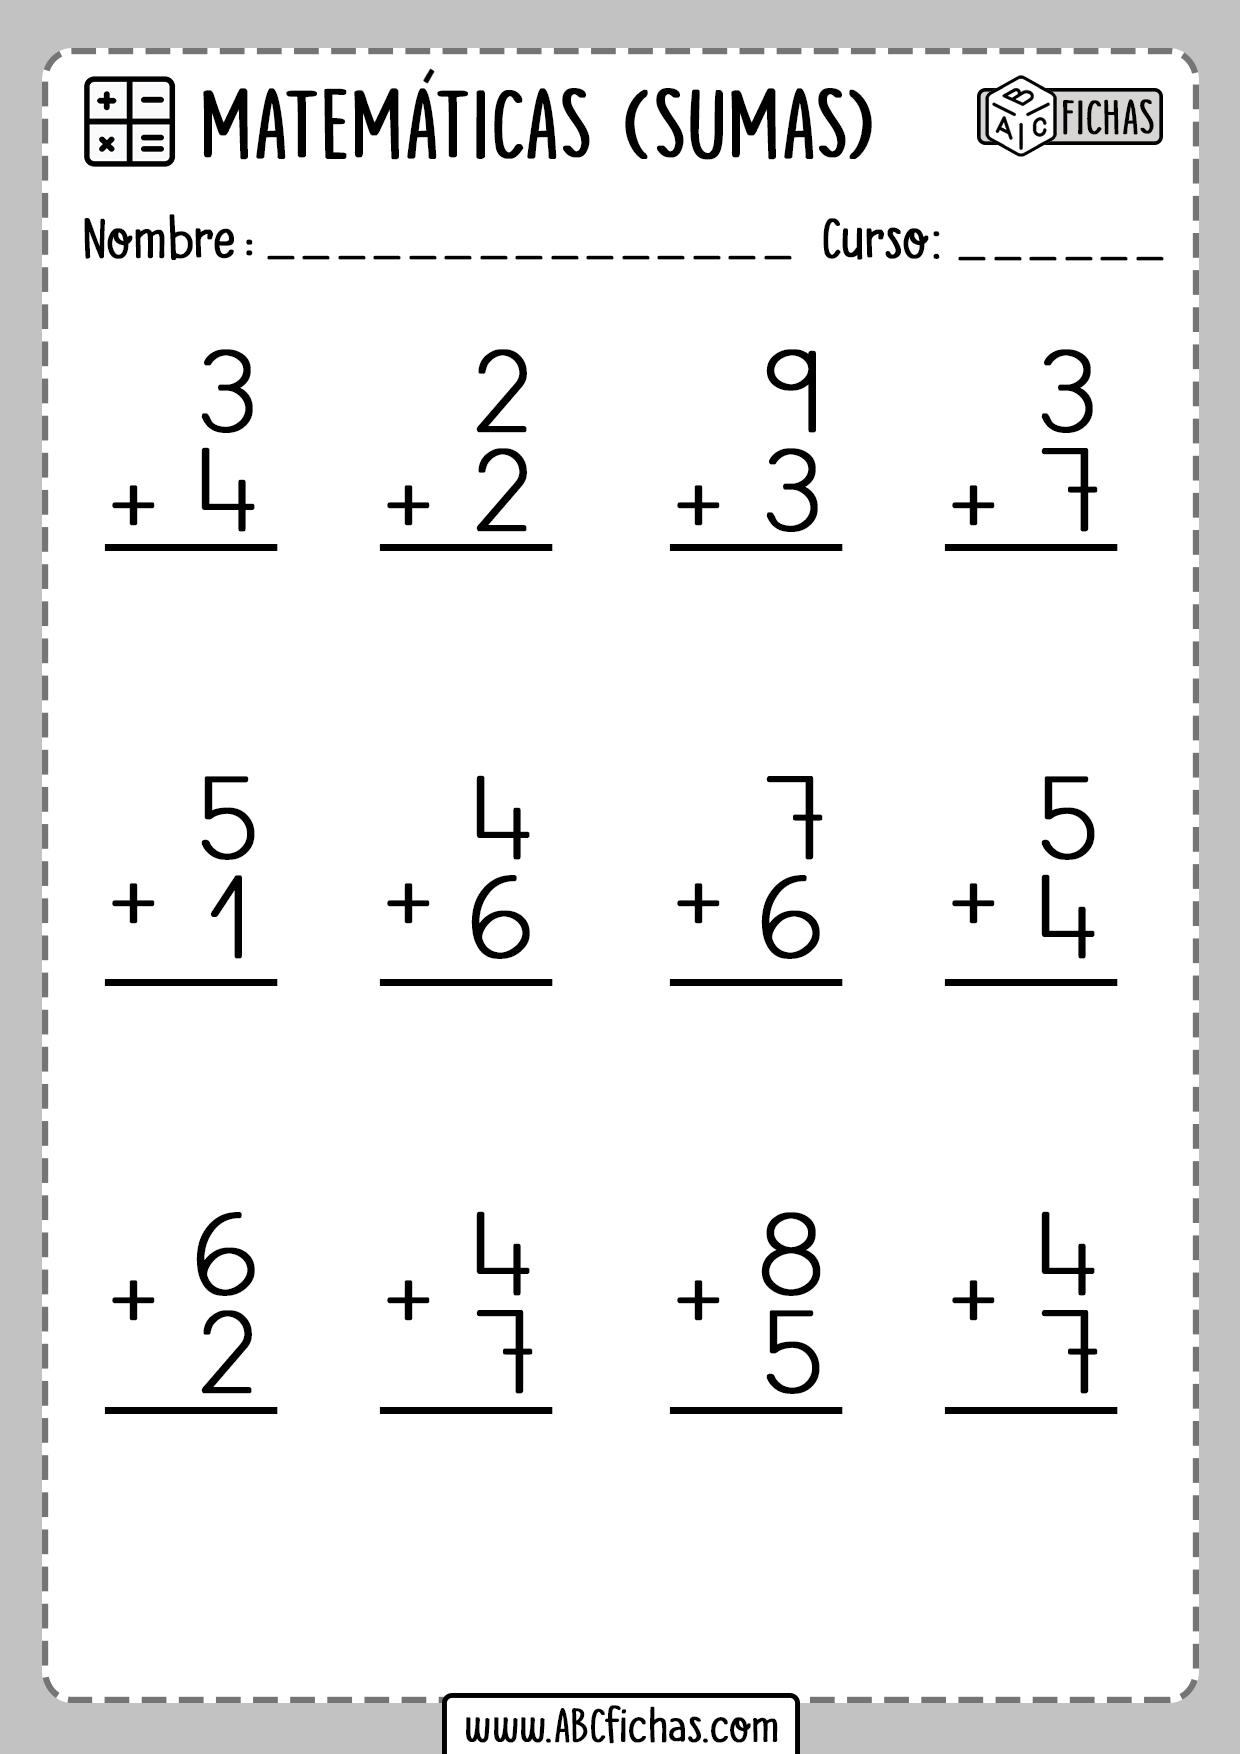 Sumas de 2 cifras Fichas de matematicas